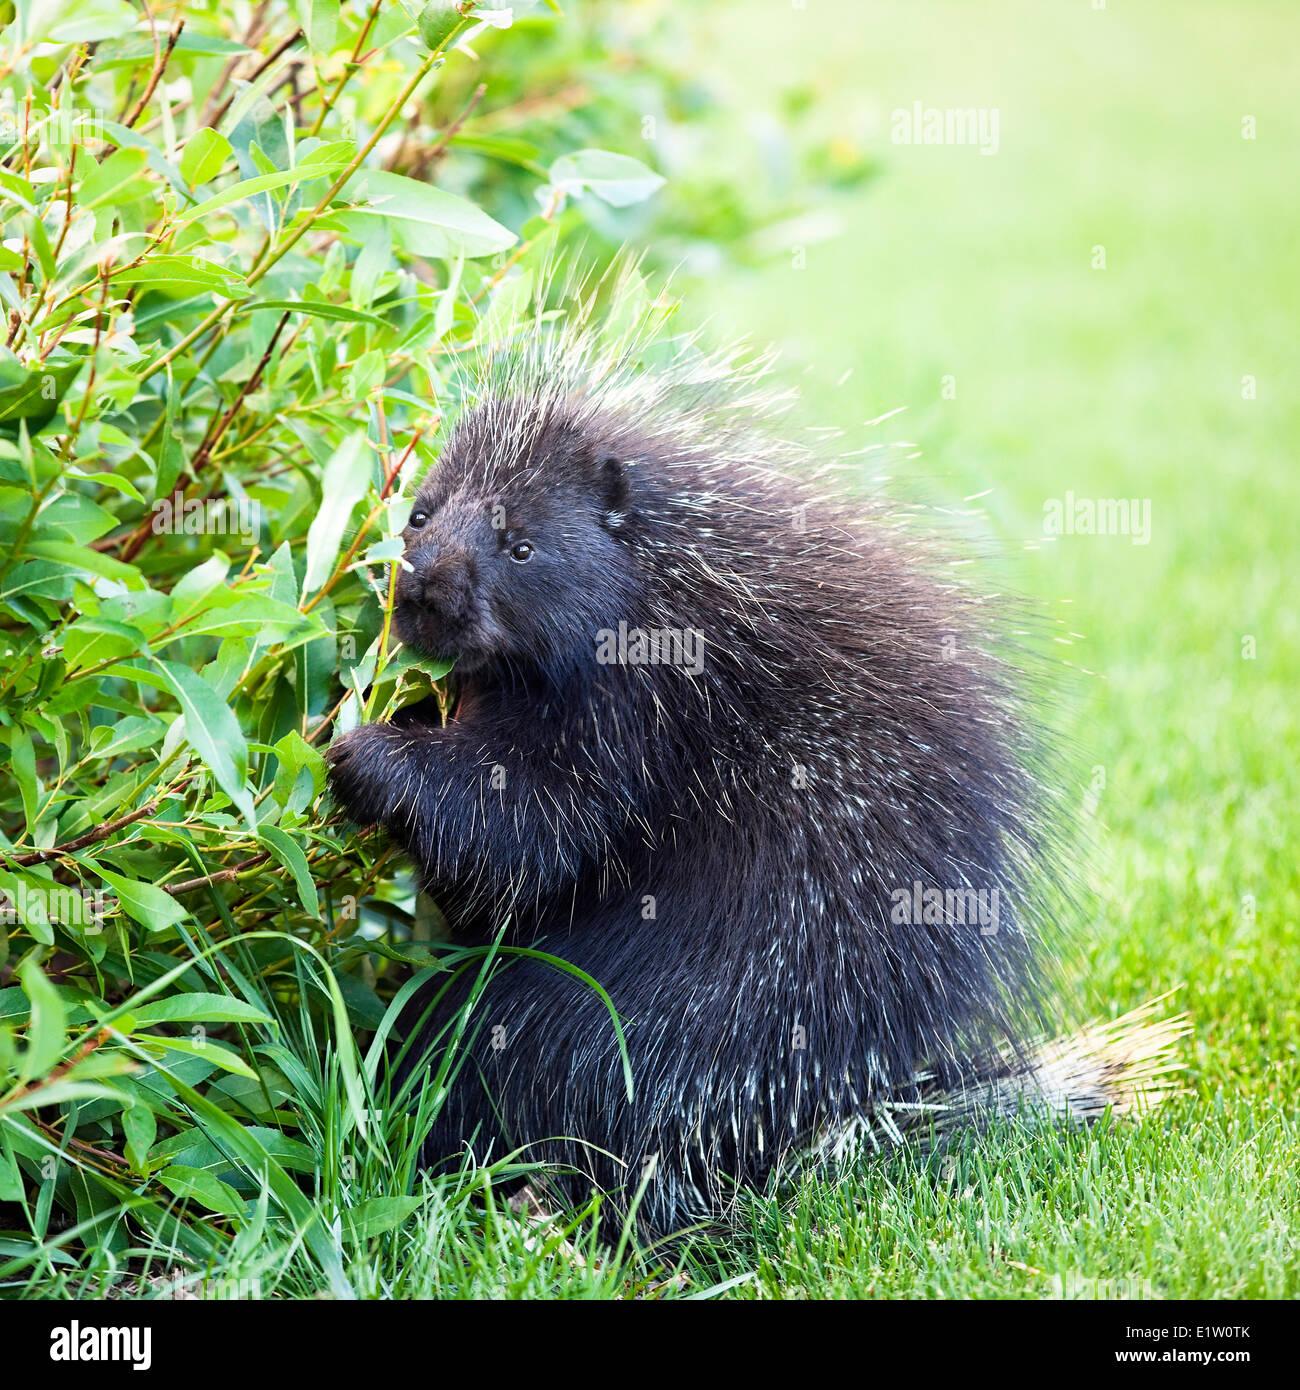 Porcupine (Erethizon dorsatum) eating leaves, Banff National Park, Alberta, Canada Stock Photo